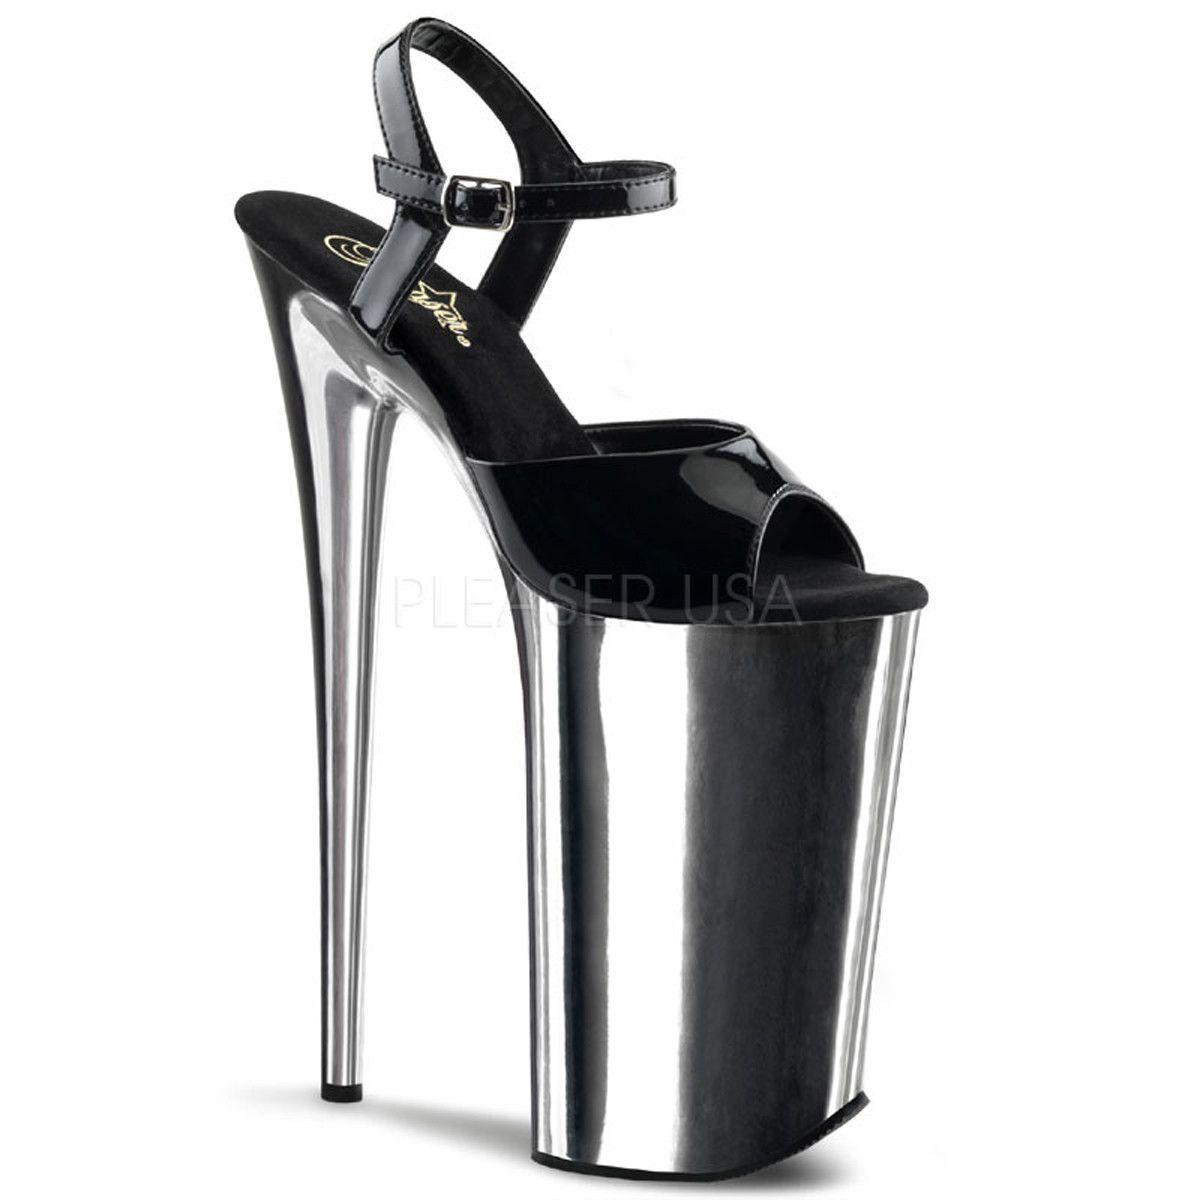 ecdb7df2765 PLEASER BEYOND-009 Black-Silver Chrome Extreme 10 Inch High Heels ...